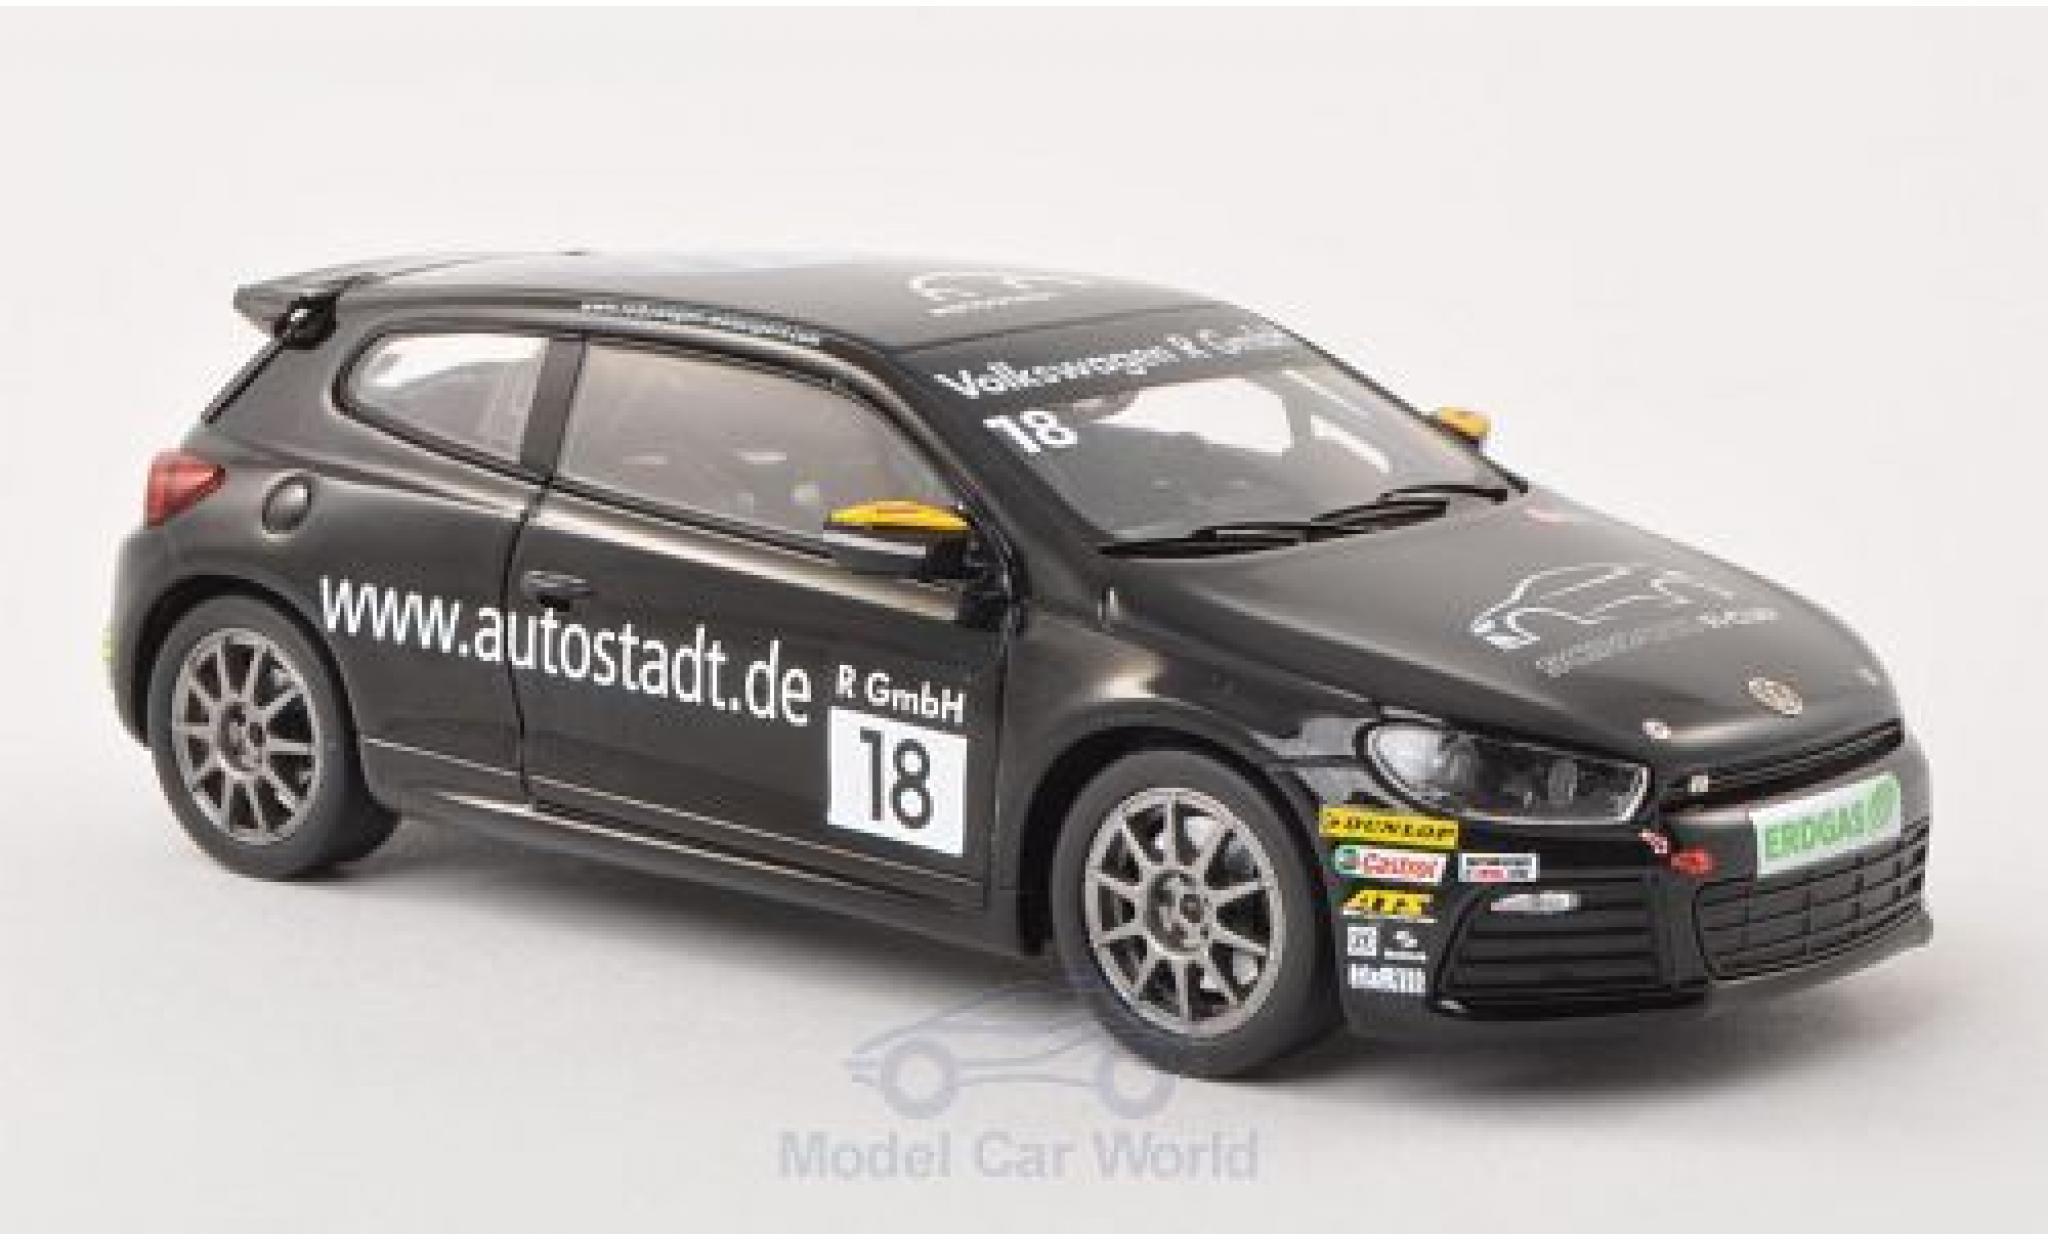 Volkswagen Scirocco R-Cup 1/43 Spark No.18 Autostadt